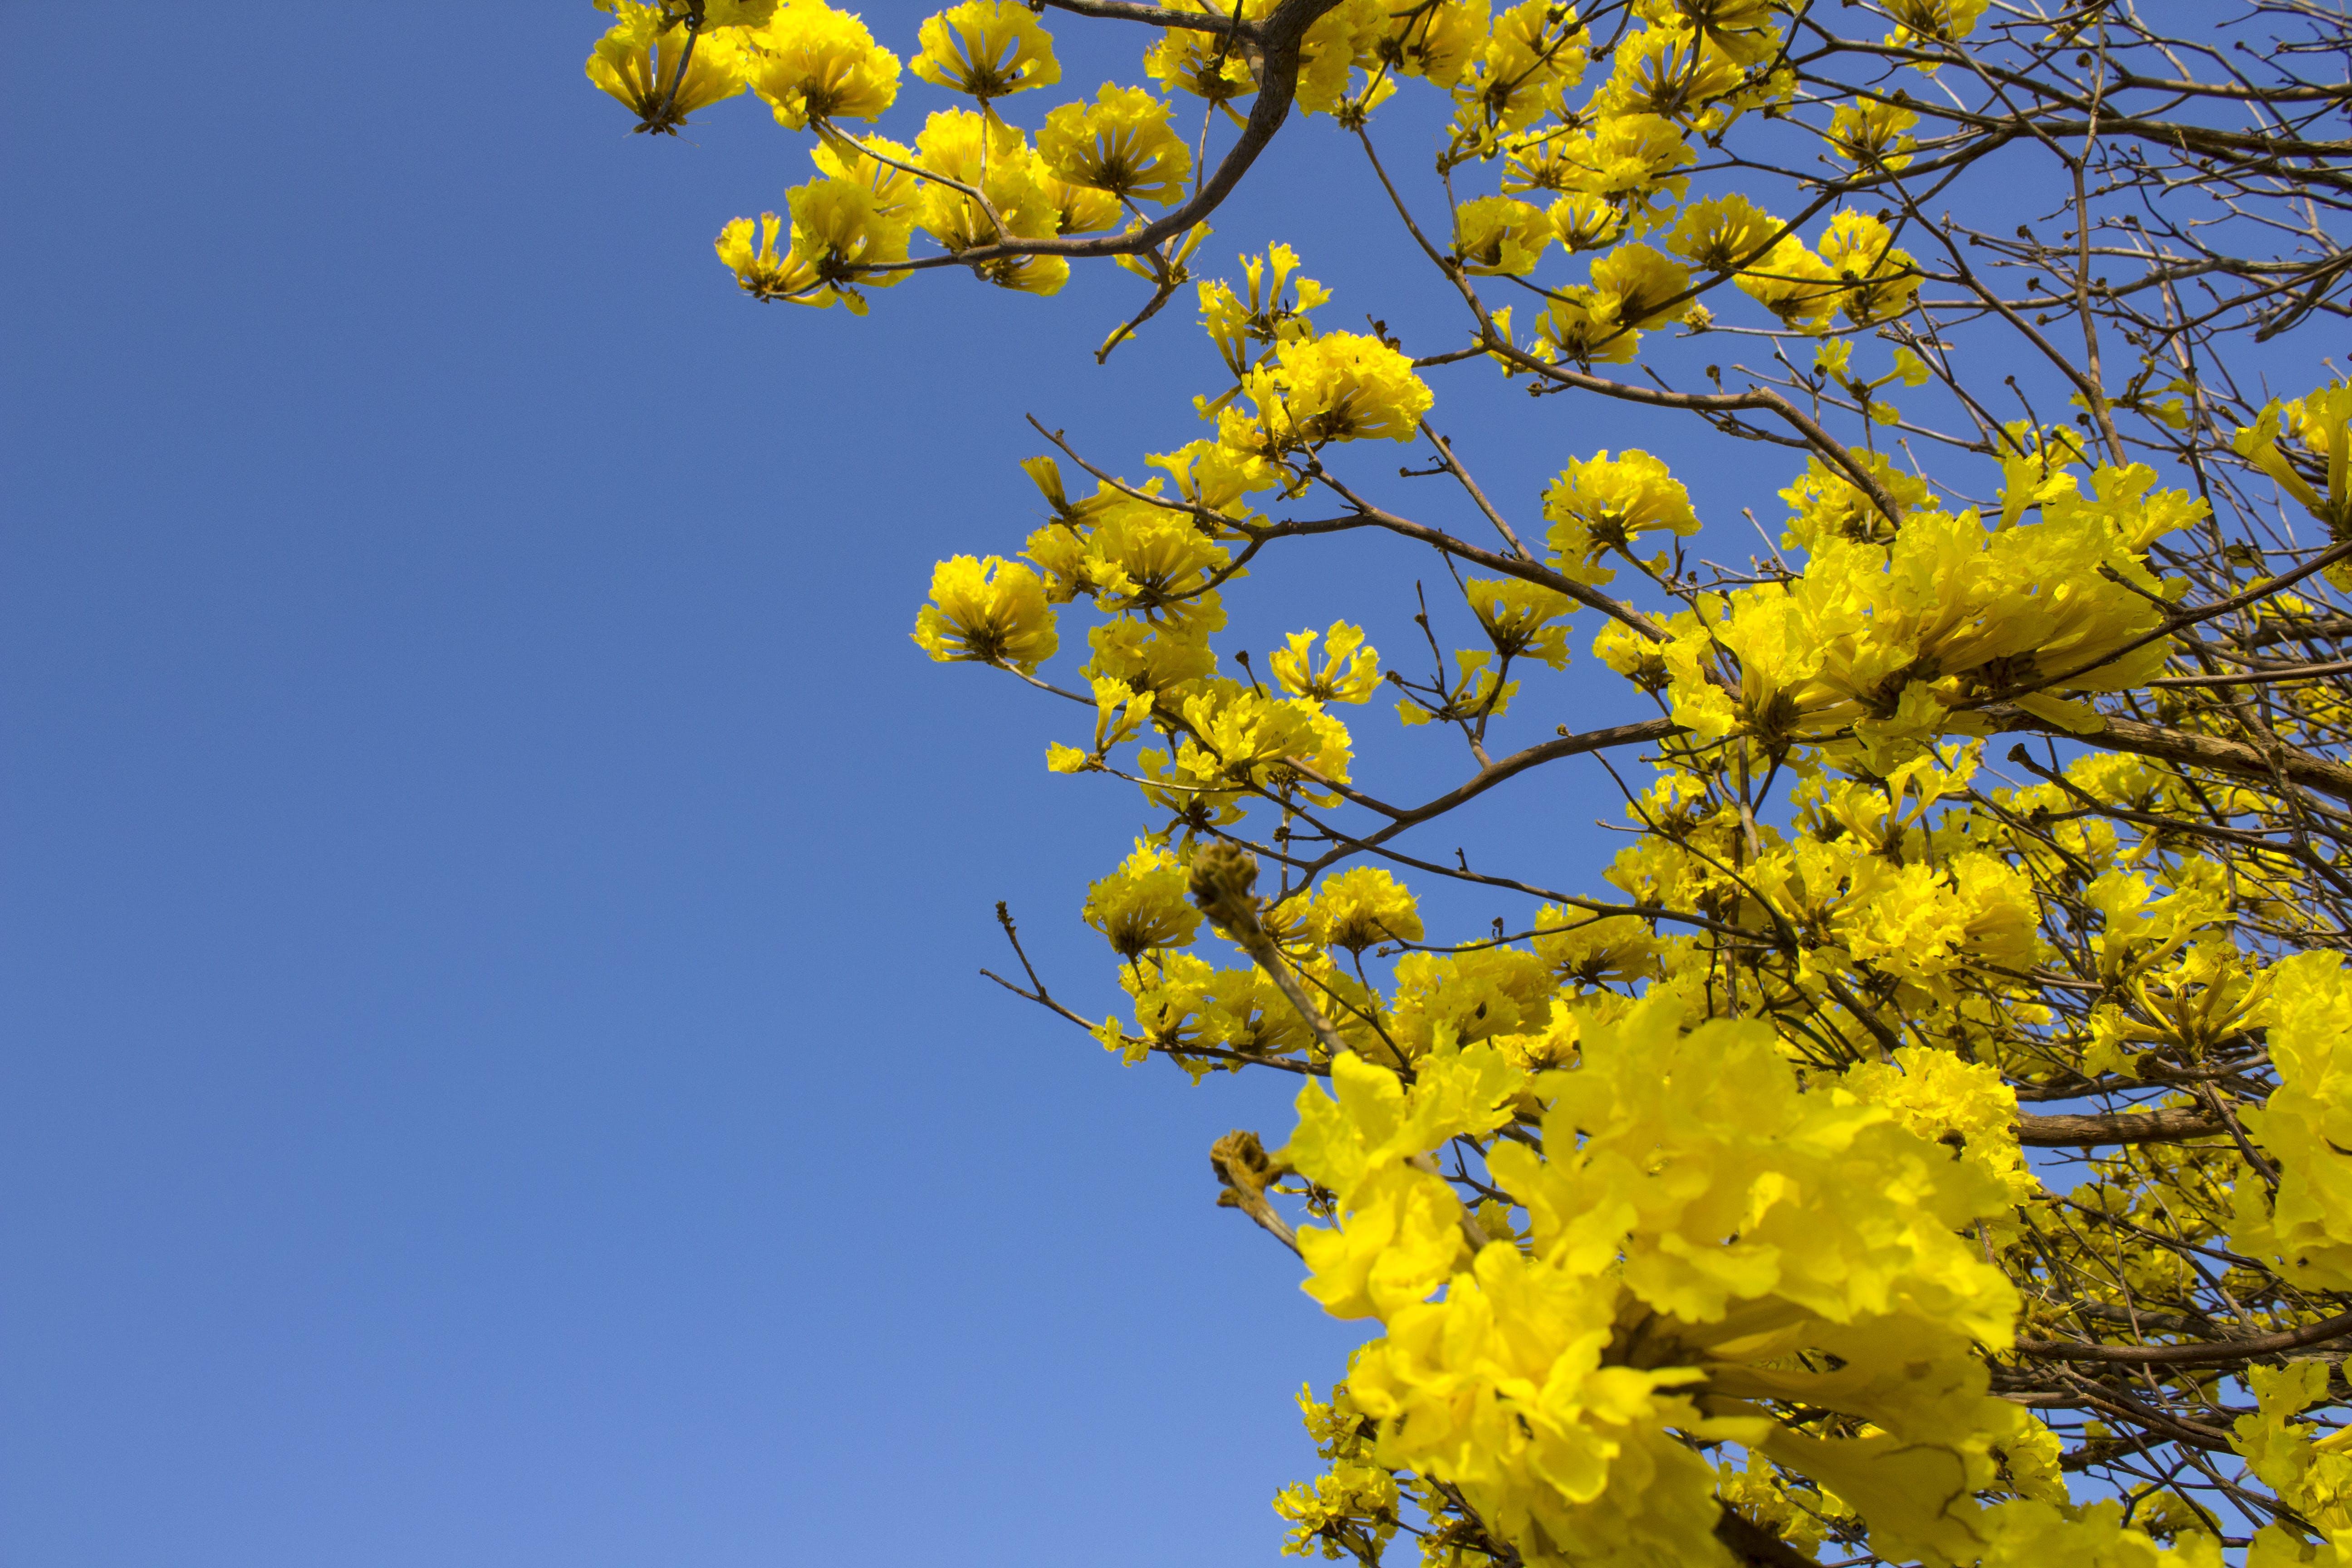 Free stock photo of casanare, colombia, flor amarillo, flower